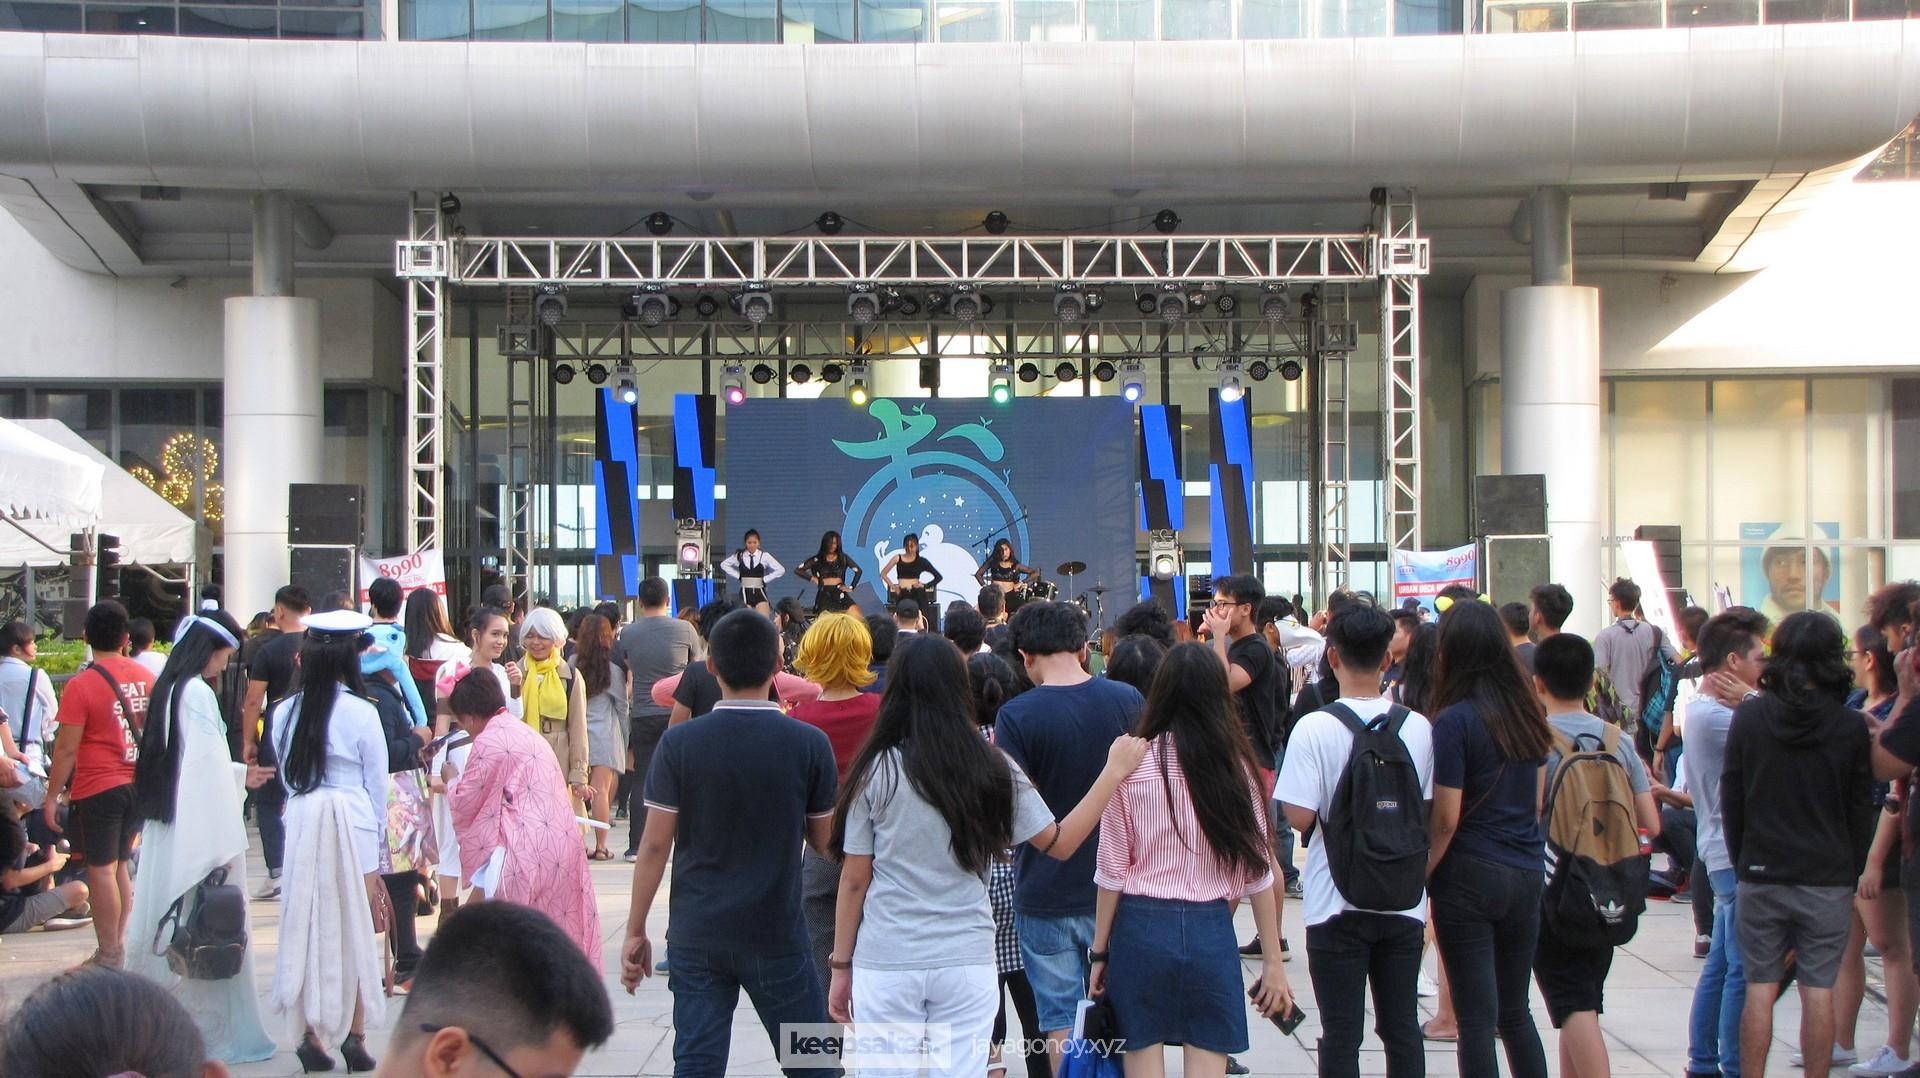 Otakufest 2020 Cebu: Eventually things fell into place